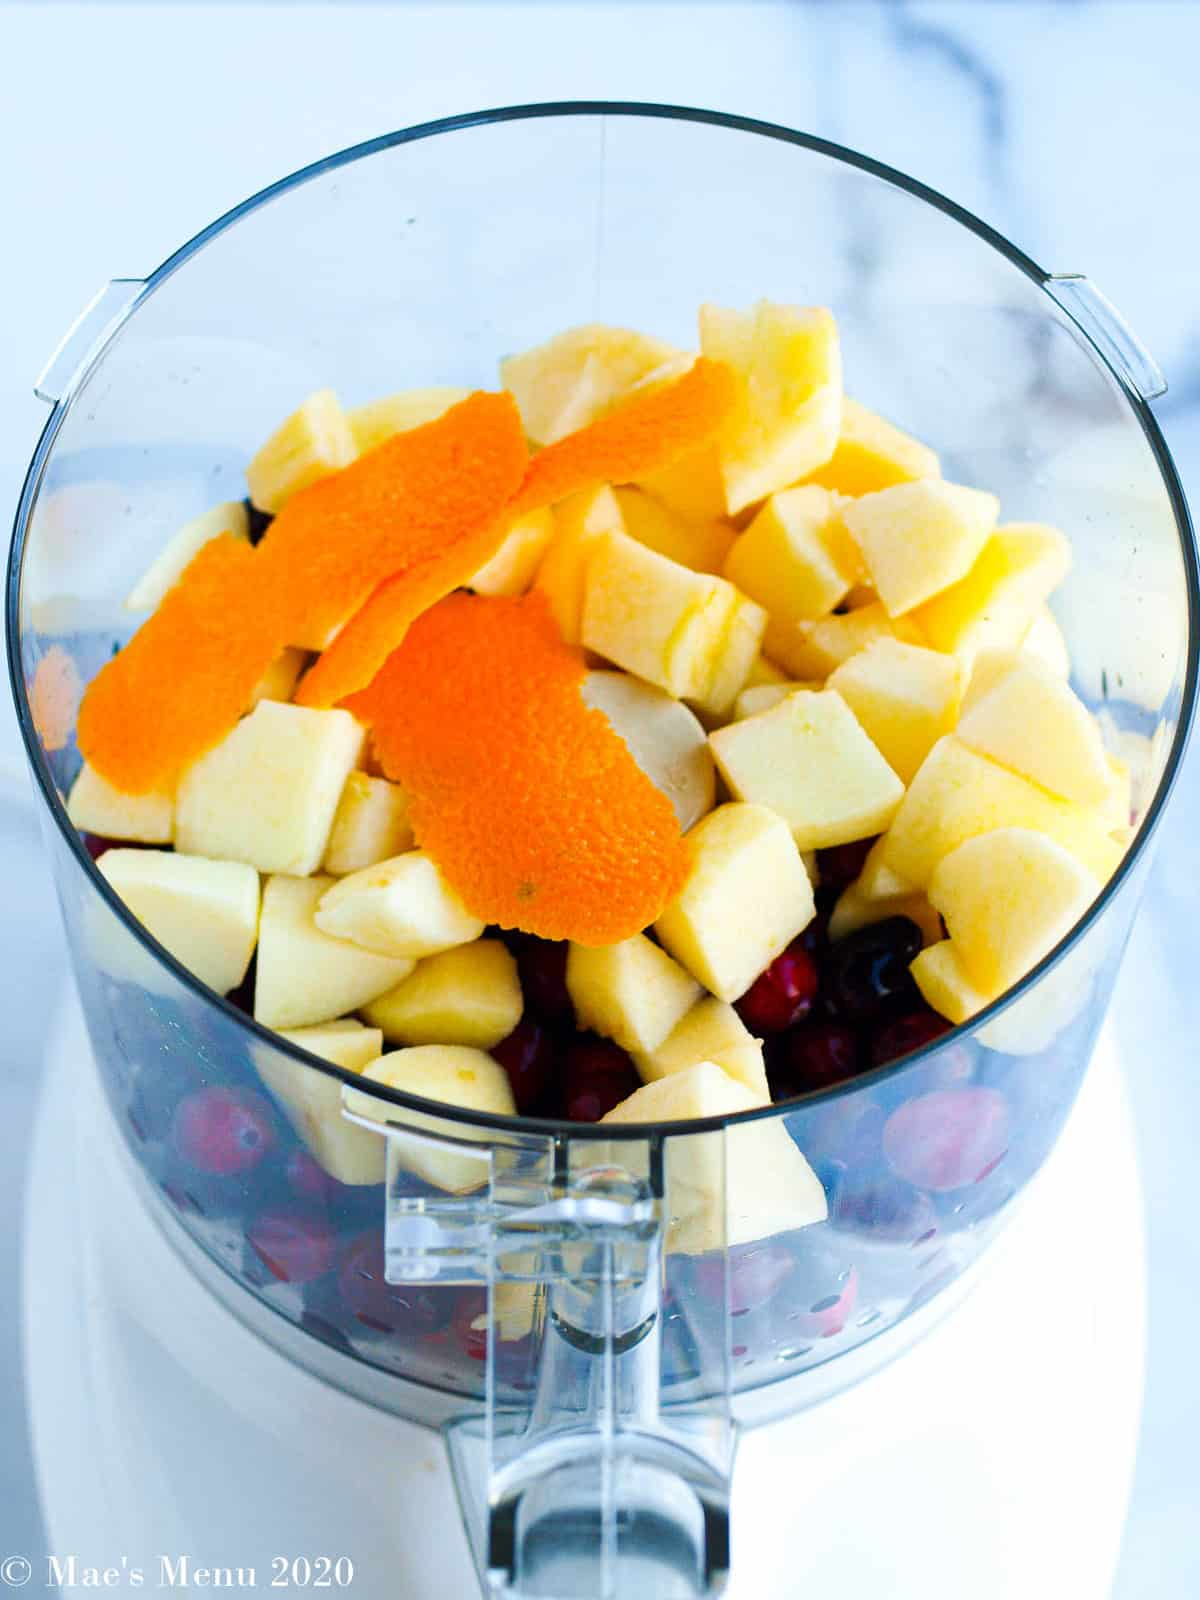 Orange peel, apple chunks, and fresh cranberries in a food processor